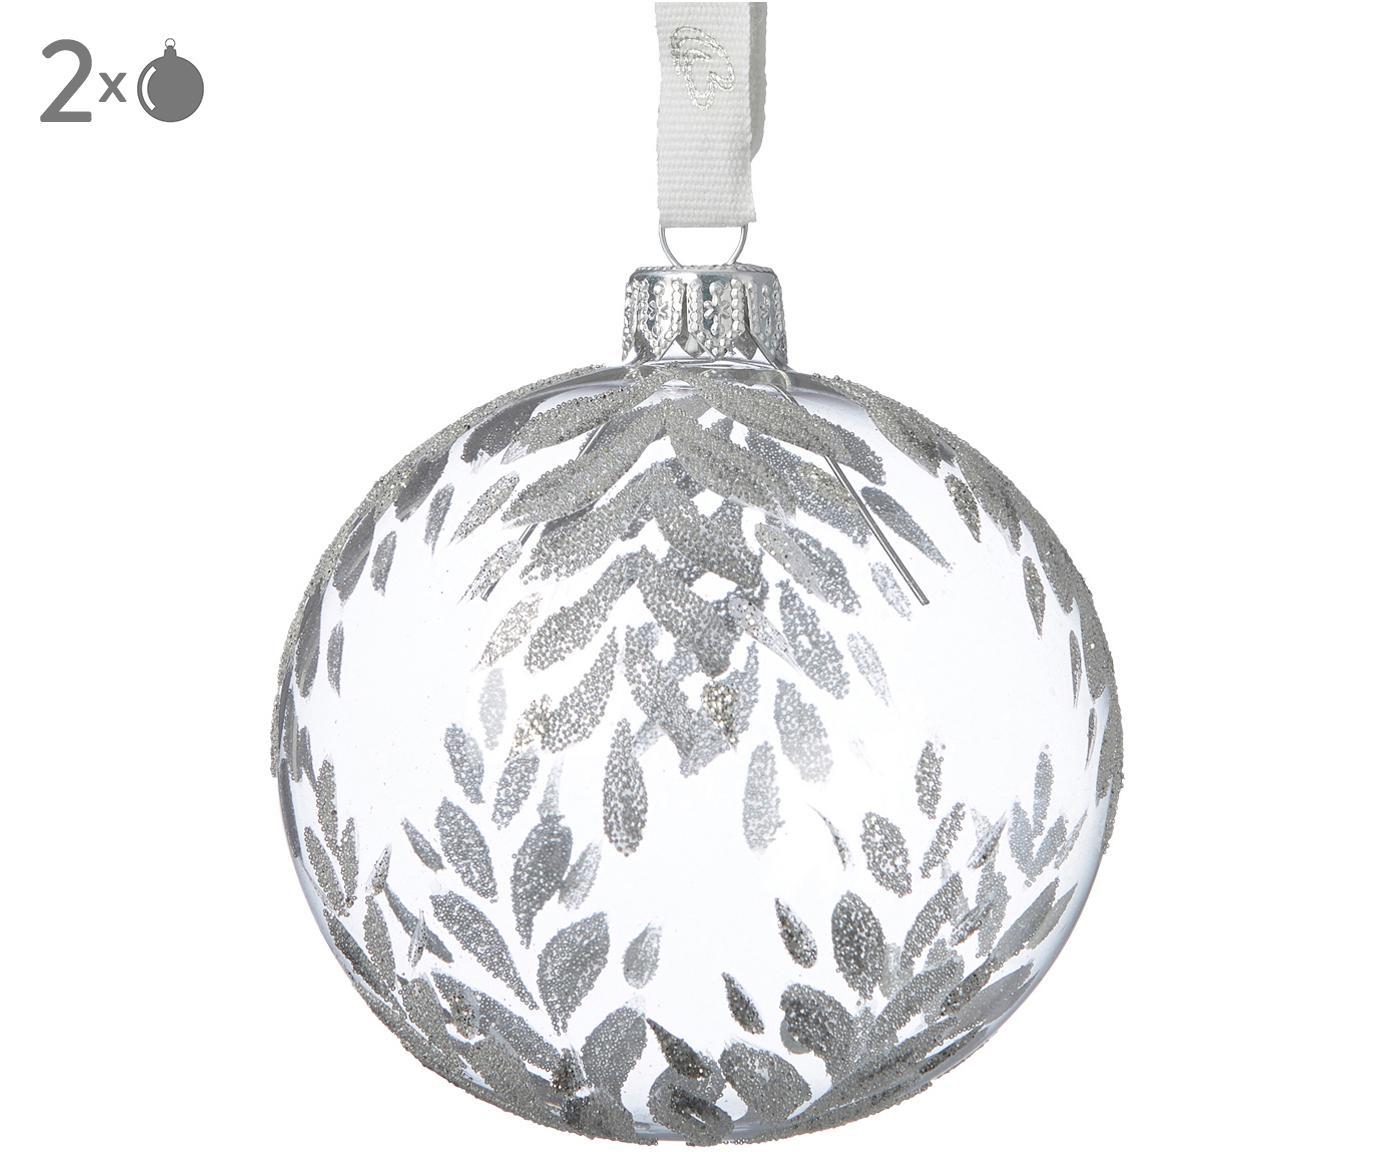 Palla di Natale Cadelia, 2 pz., Trasparente, argentato, Ø 8 x Alt. 8 cm